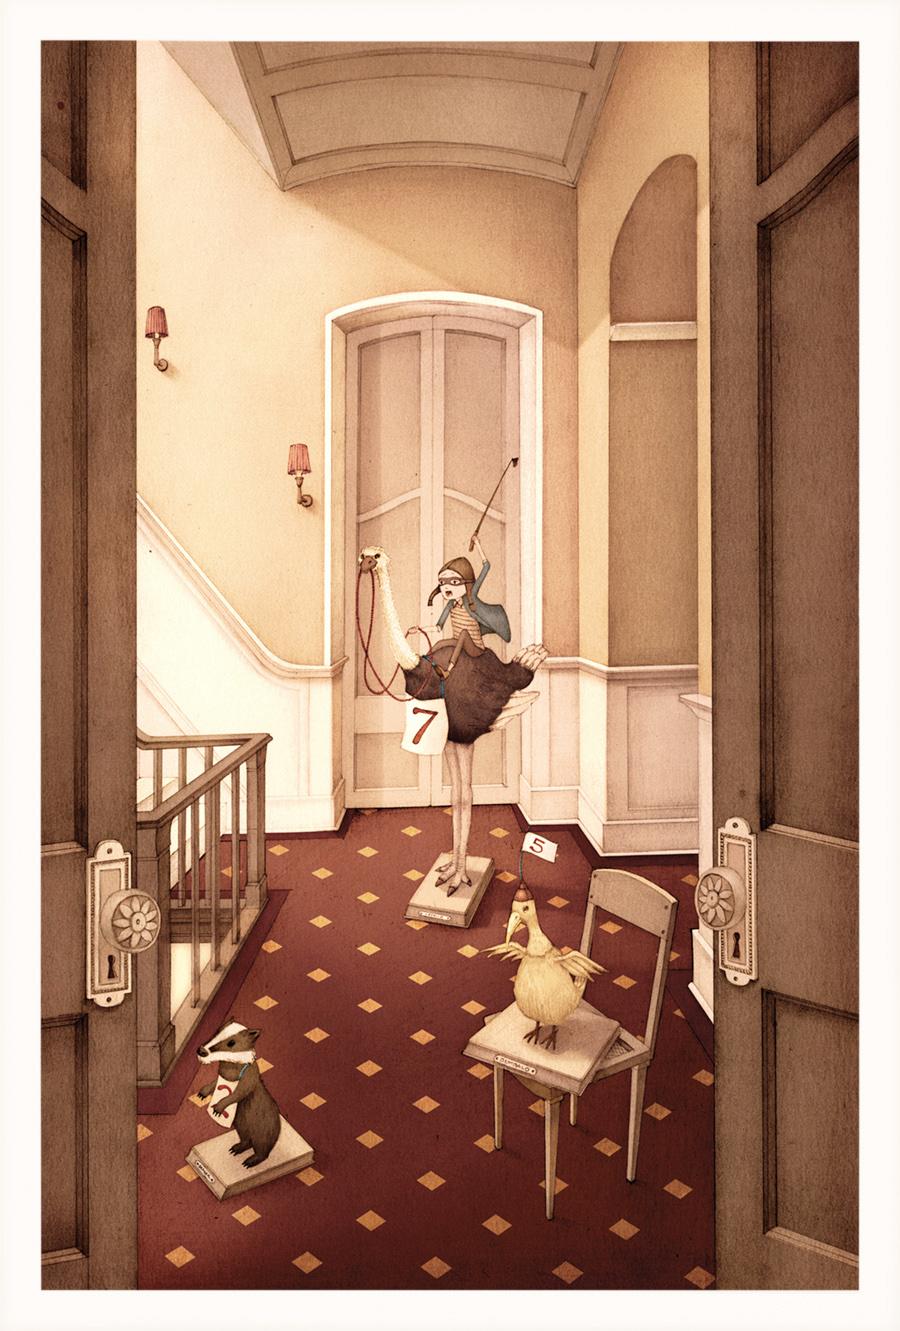 Nicholas Gannon / The Doldrums / The Ostrich